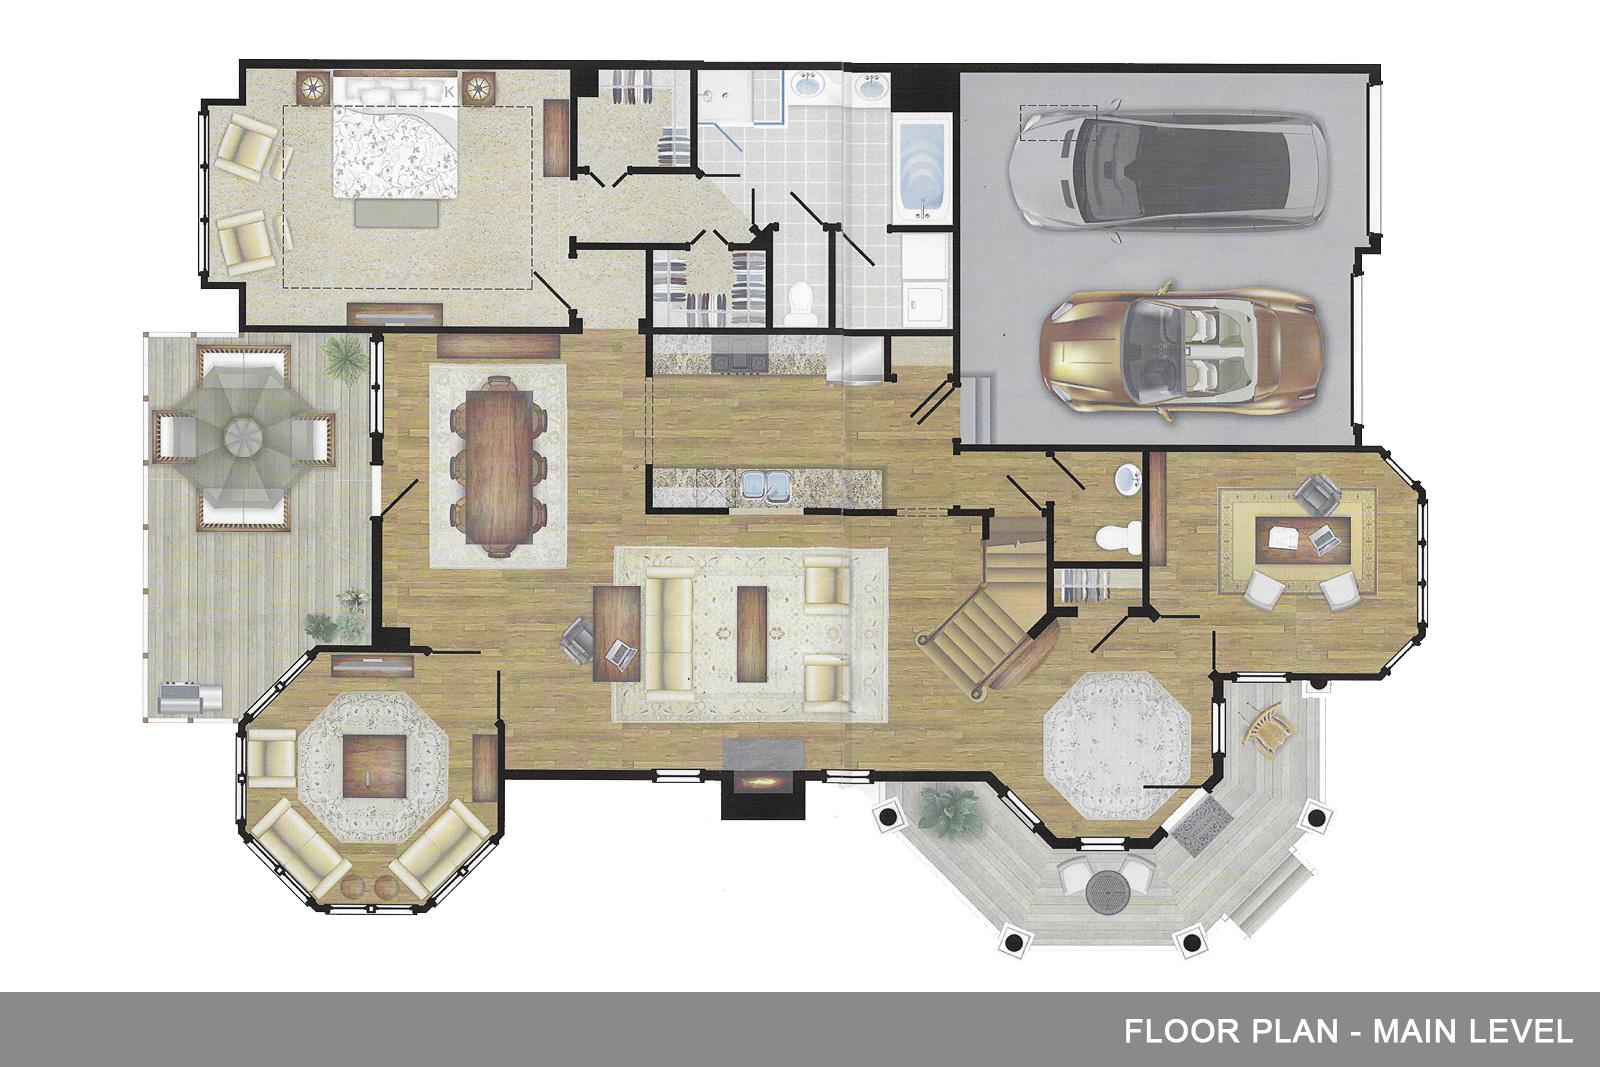 25-Floor-Plan-Main-Level.jpg